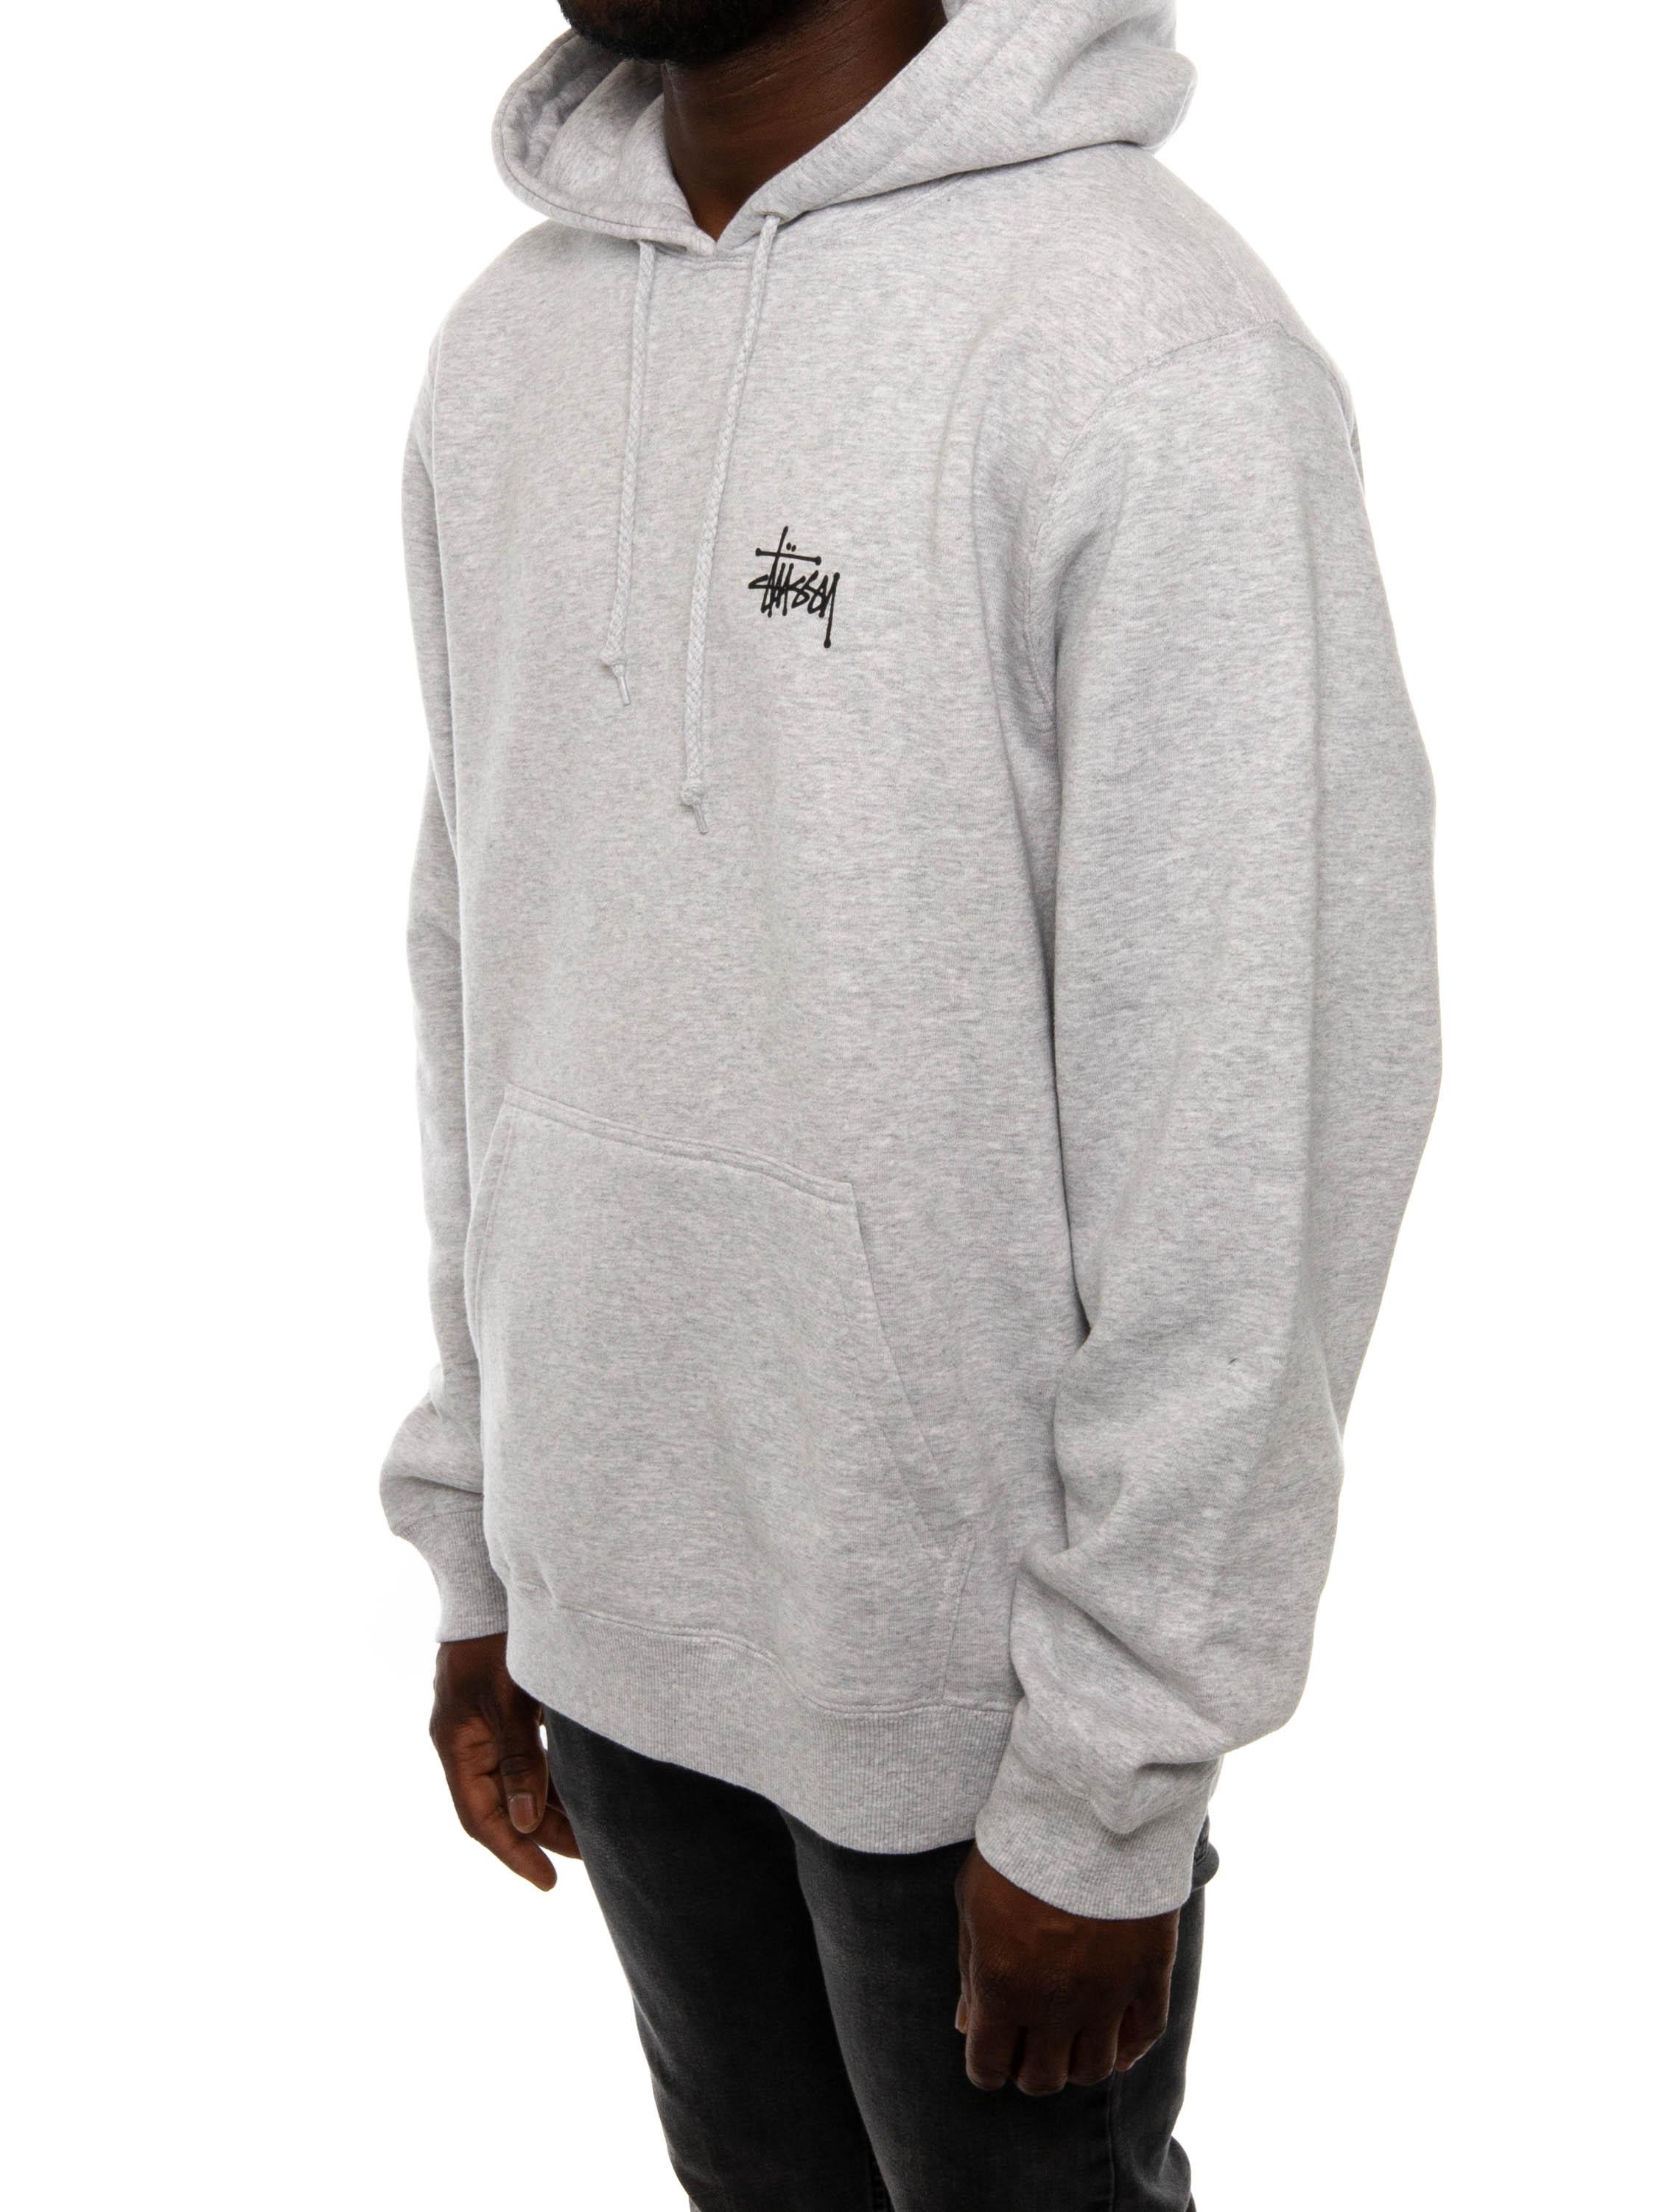 Basic stussy hoody black | Fashion online kaufen bei peoples place